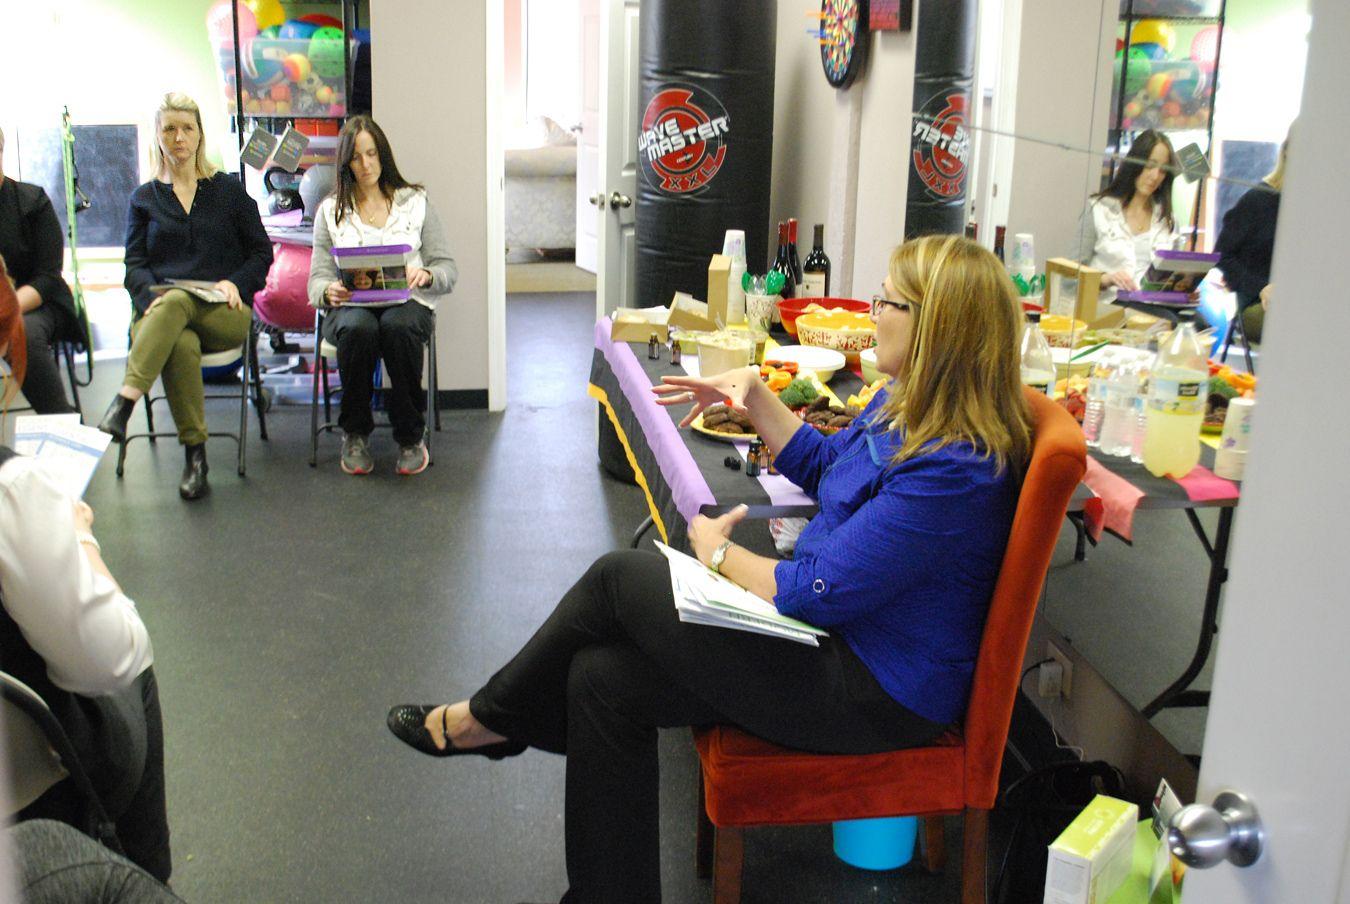 NEW - The Network of Entrepreneurial Women